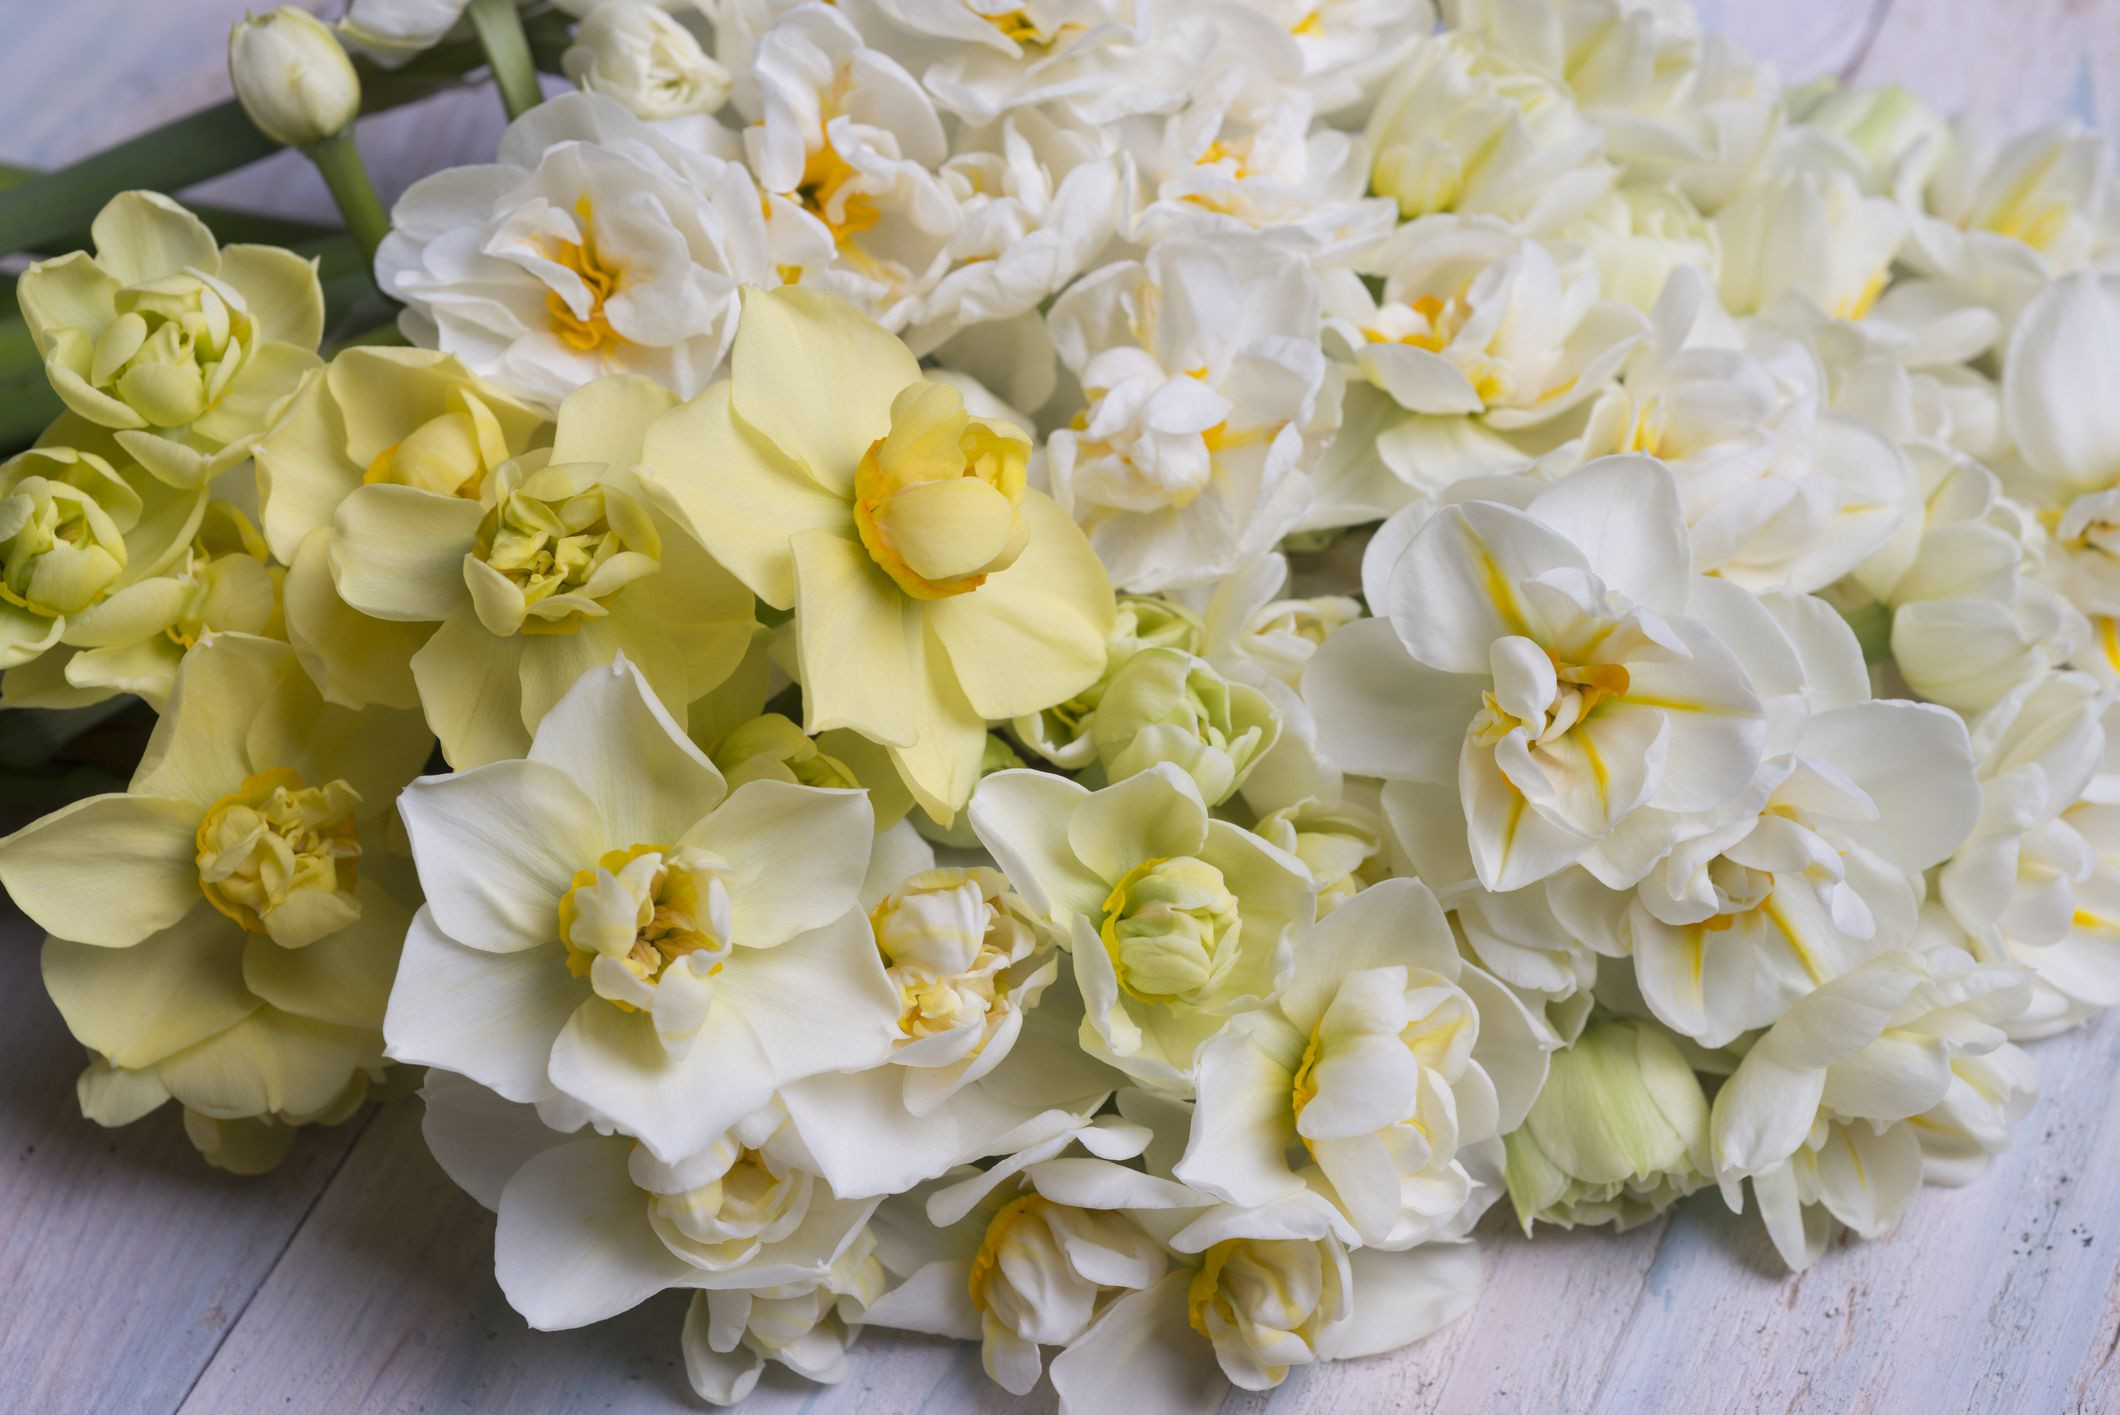 big vase floral arrangements of winter flowers for weddings inside daffodilbouquet 57d7229b5f9b589b0a59de12